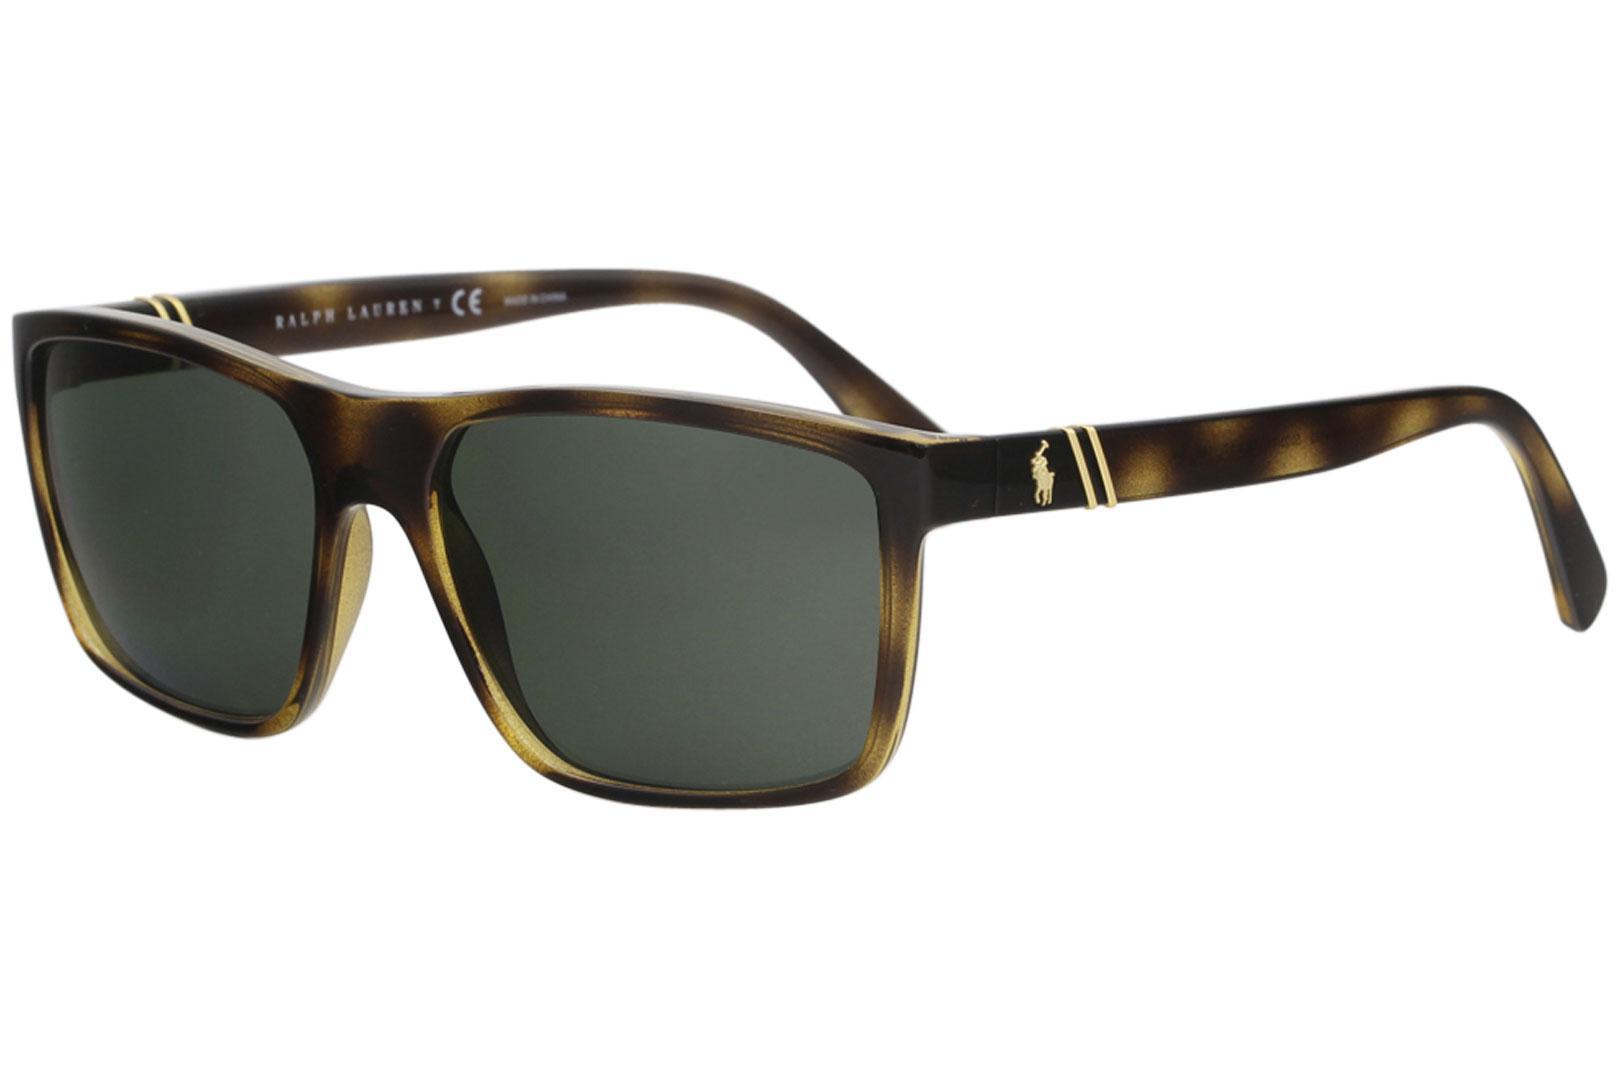 Ralph Lauren Ph4133 Men's Polo Fashion Sunglasses Rectangle A3Rjq54L